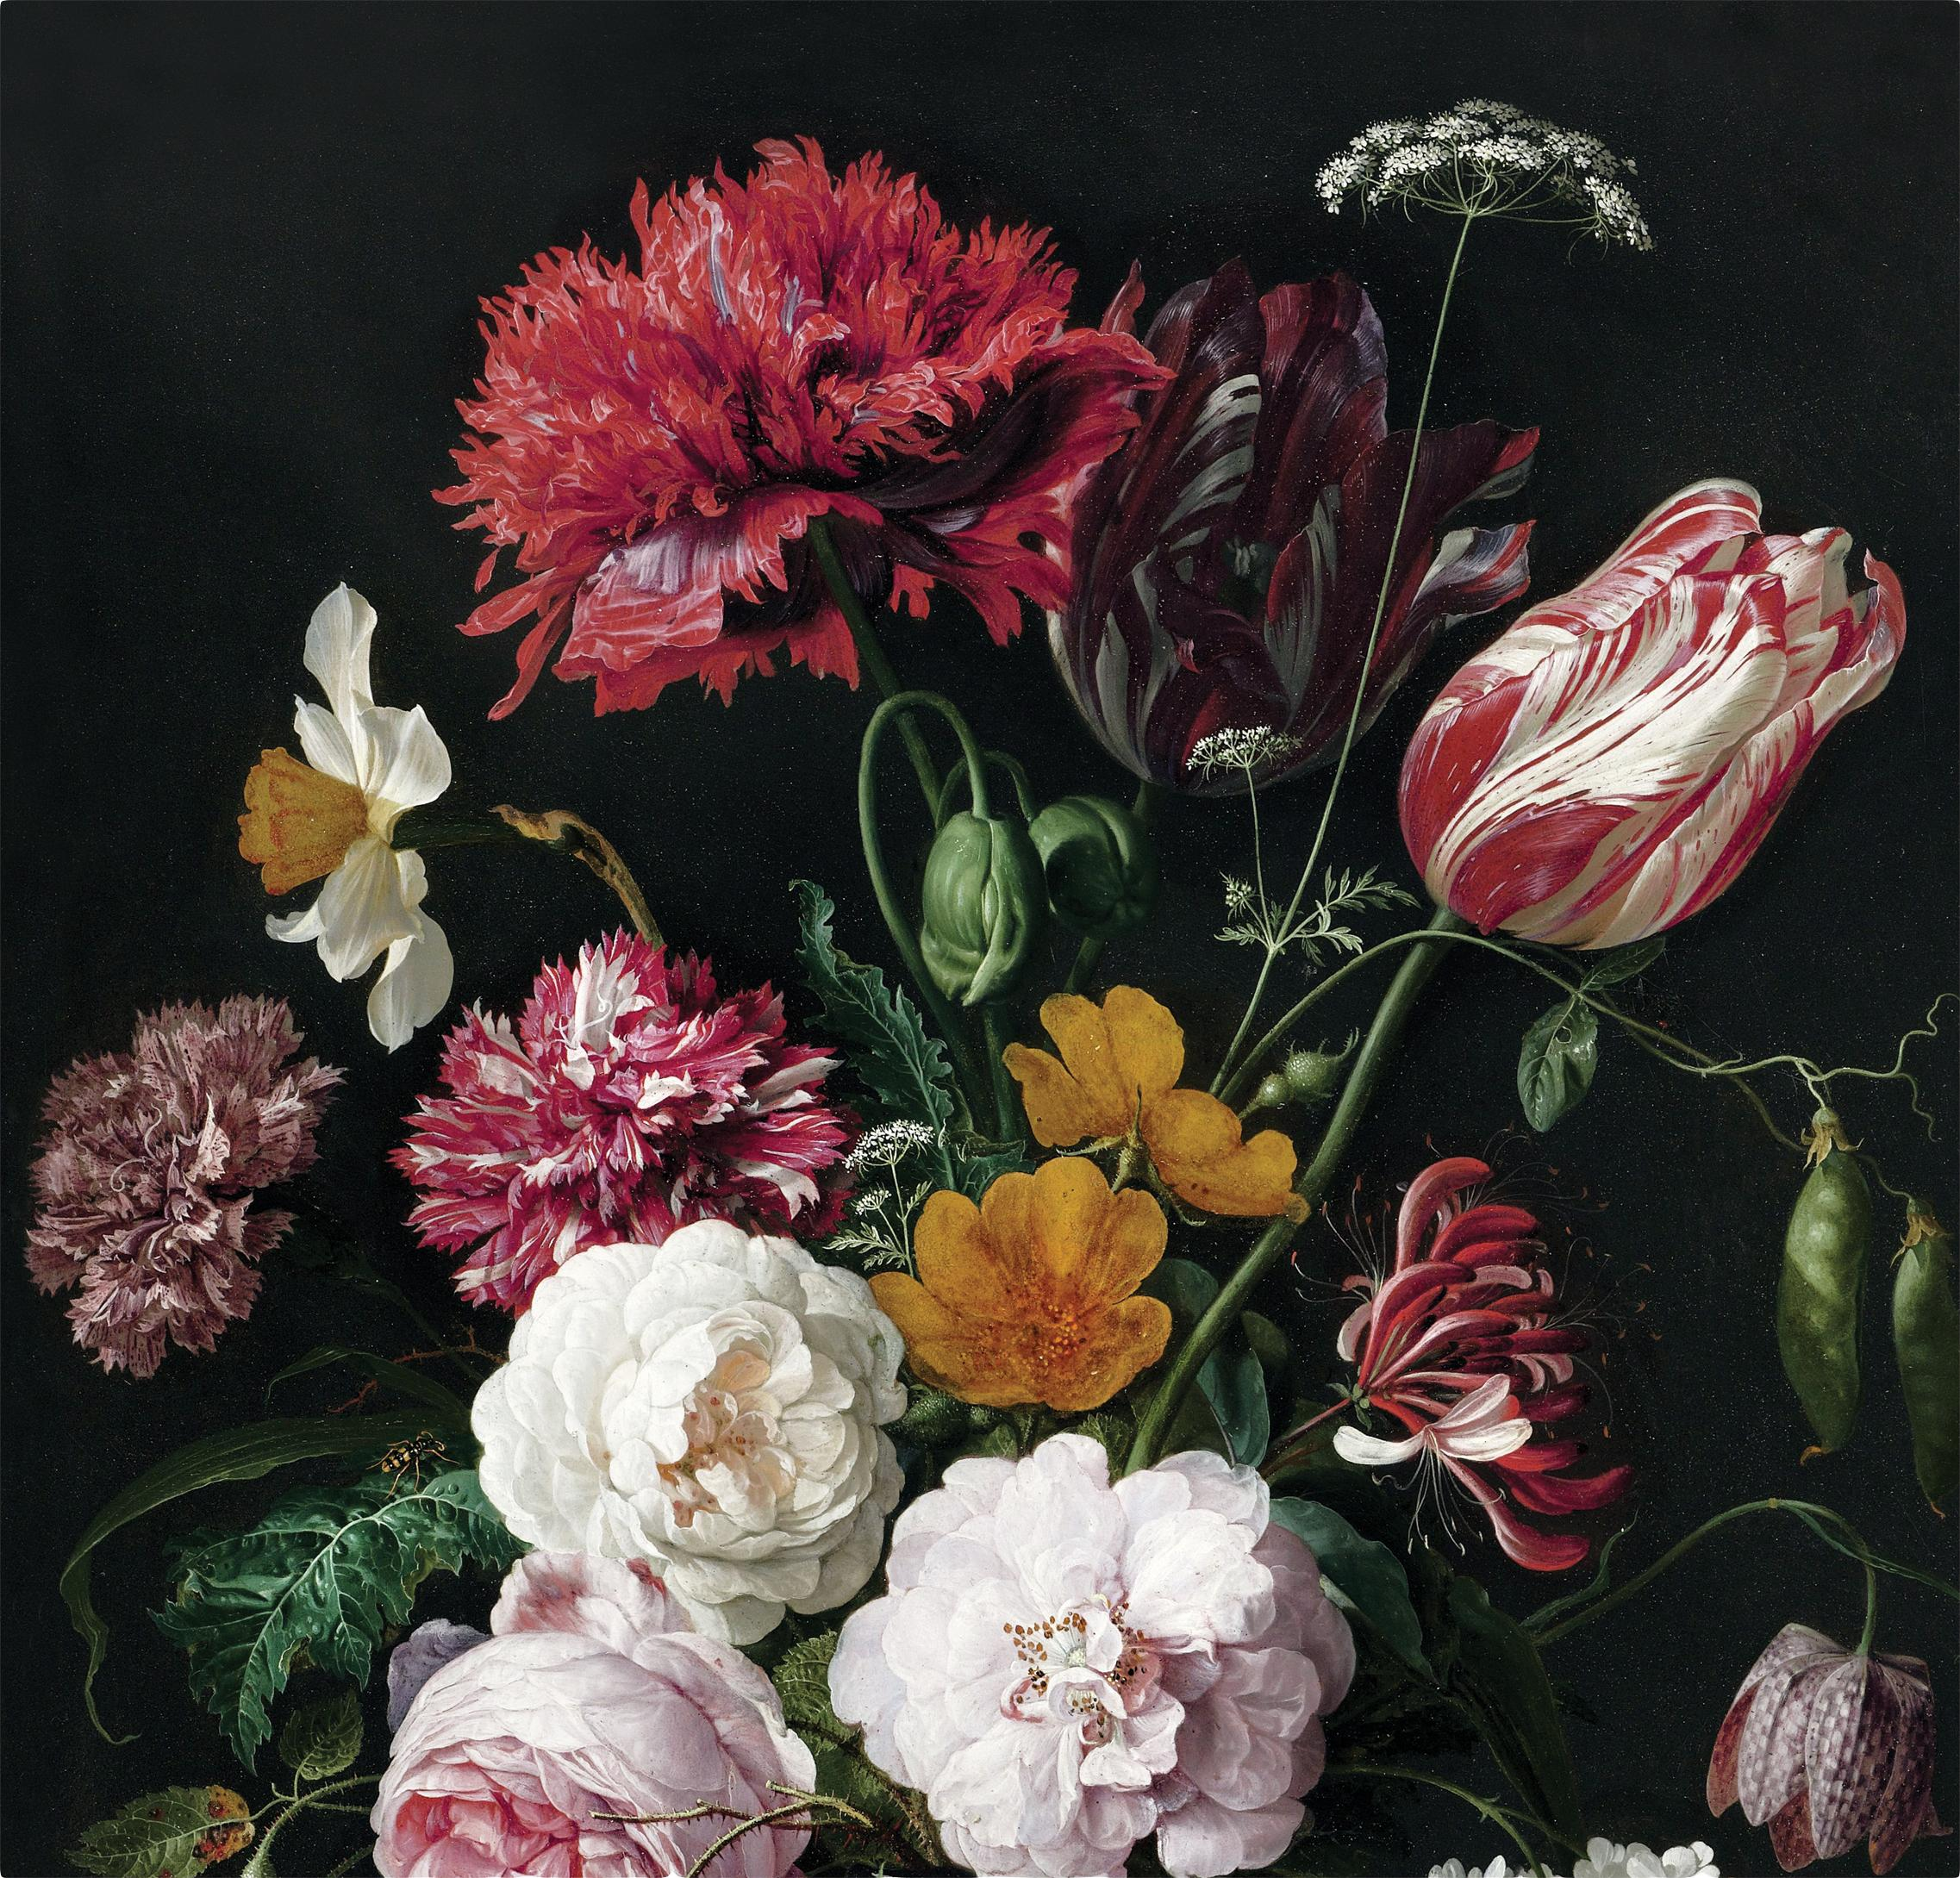 Carta da parati Golden Age Flowers, Pelo ecologico e biodegradabile, Multicolore opaco, Larg. 292 x Alt. 280 cm